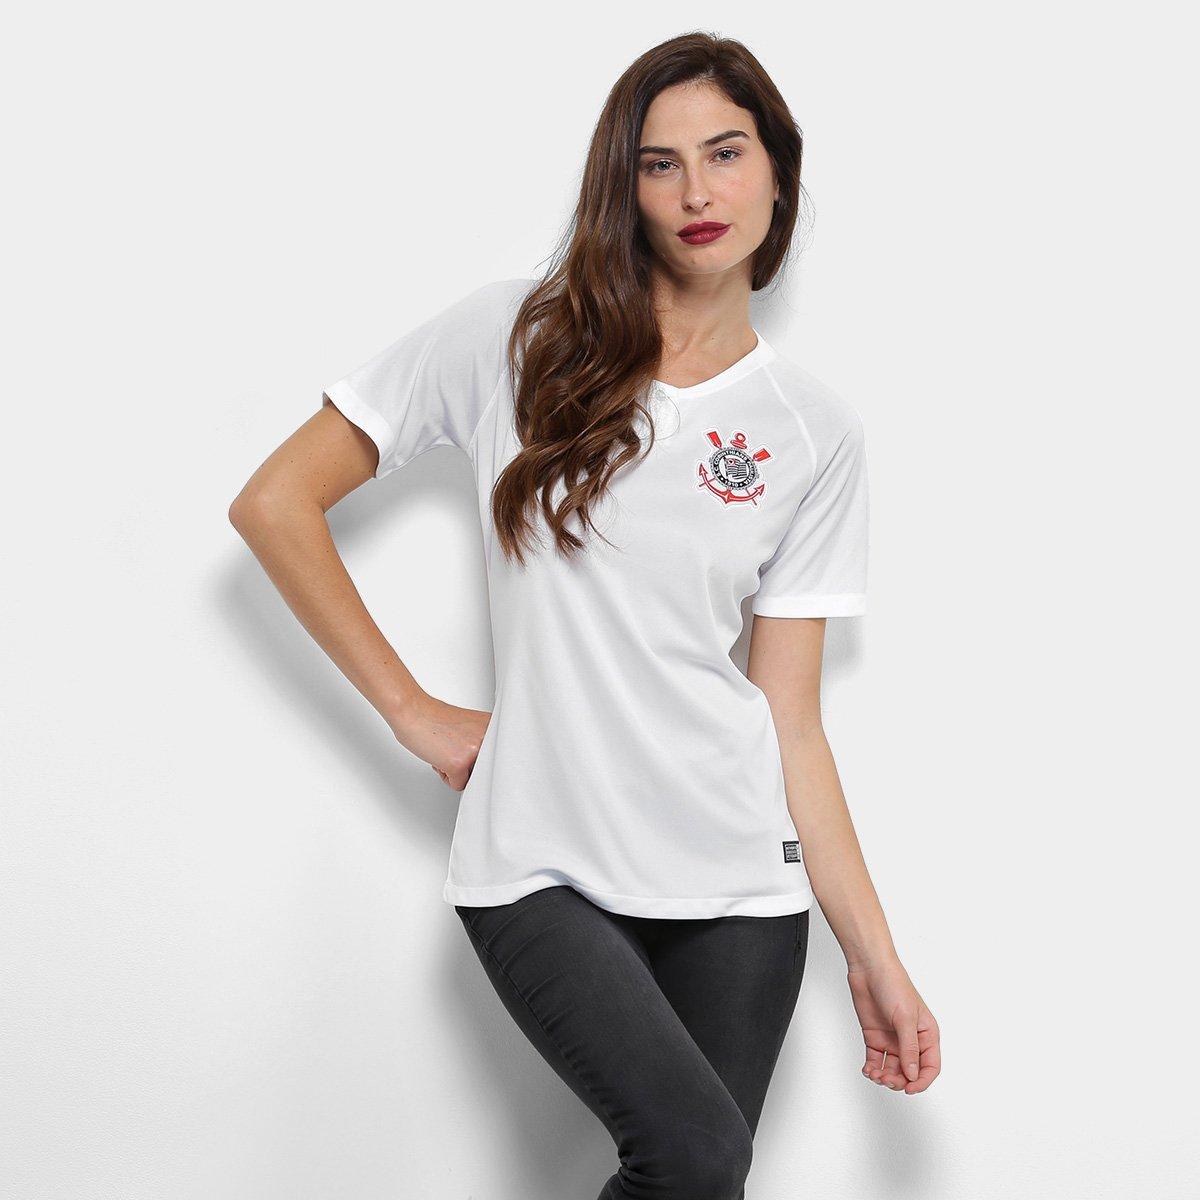 86c26cf3d Camisa Corinthians I 18 19 s n° - Torcedor Nike Feminina - Compre Agora